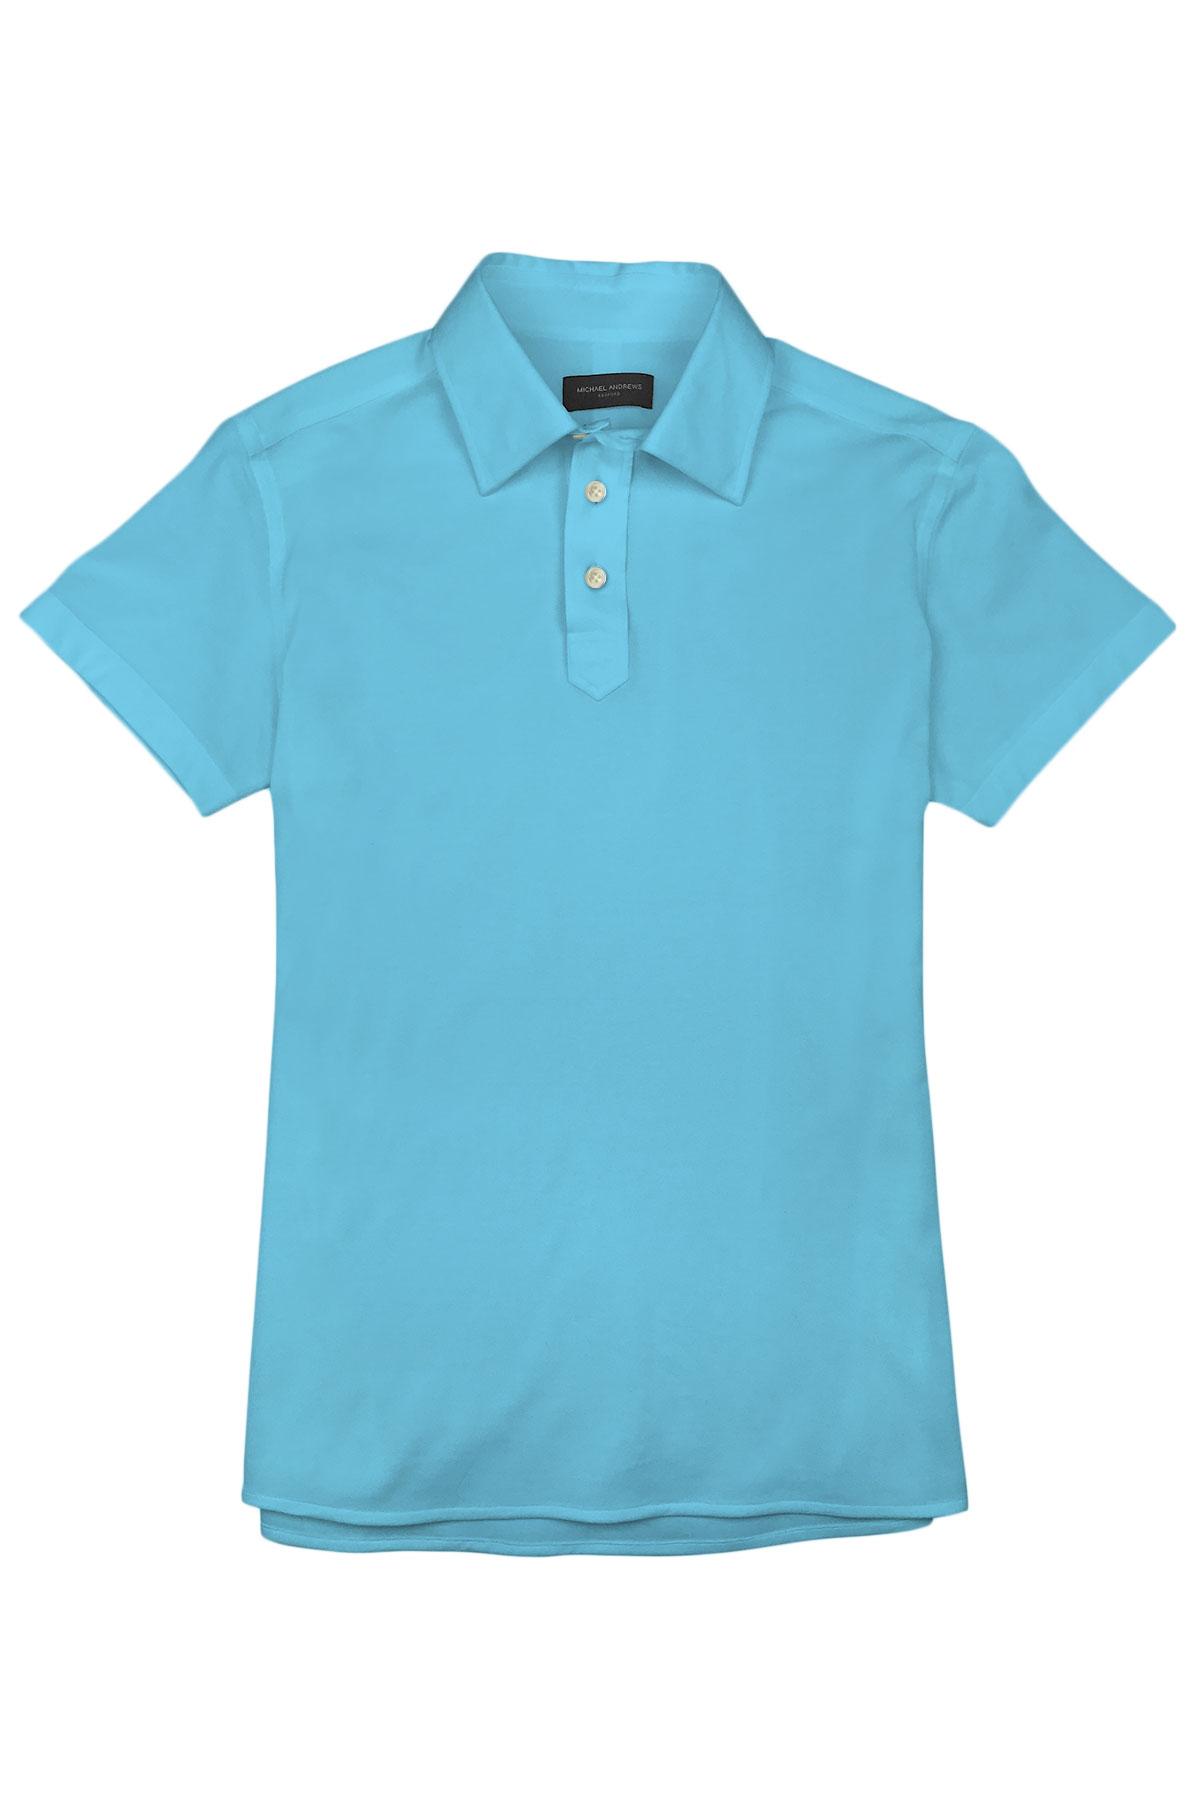 Maya Blue Pique Polo Shirt